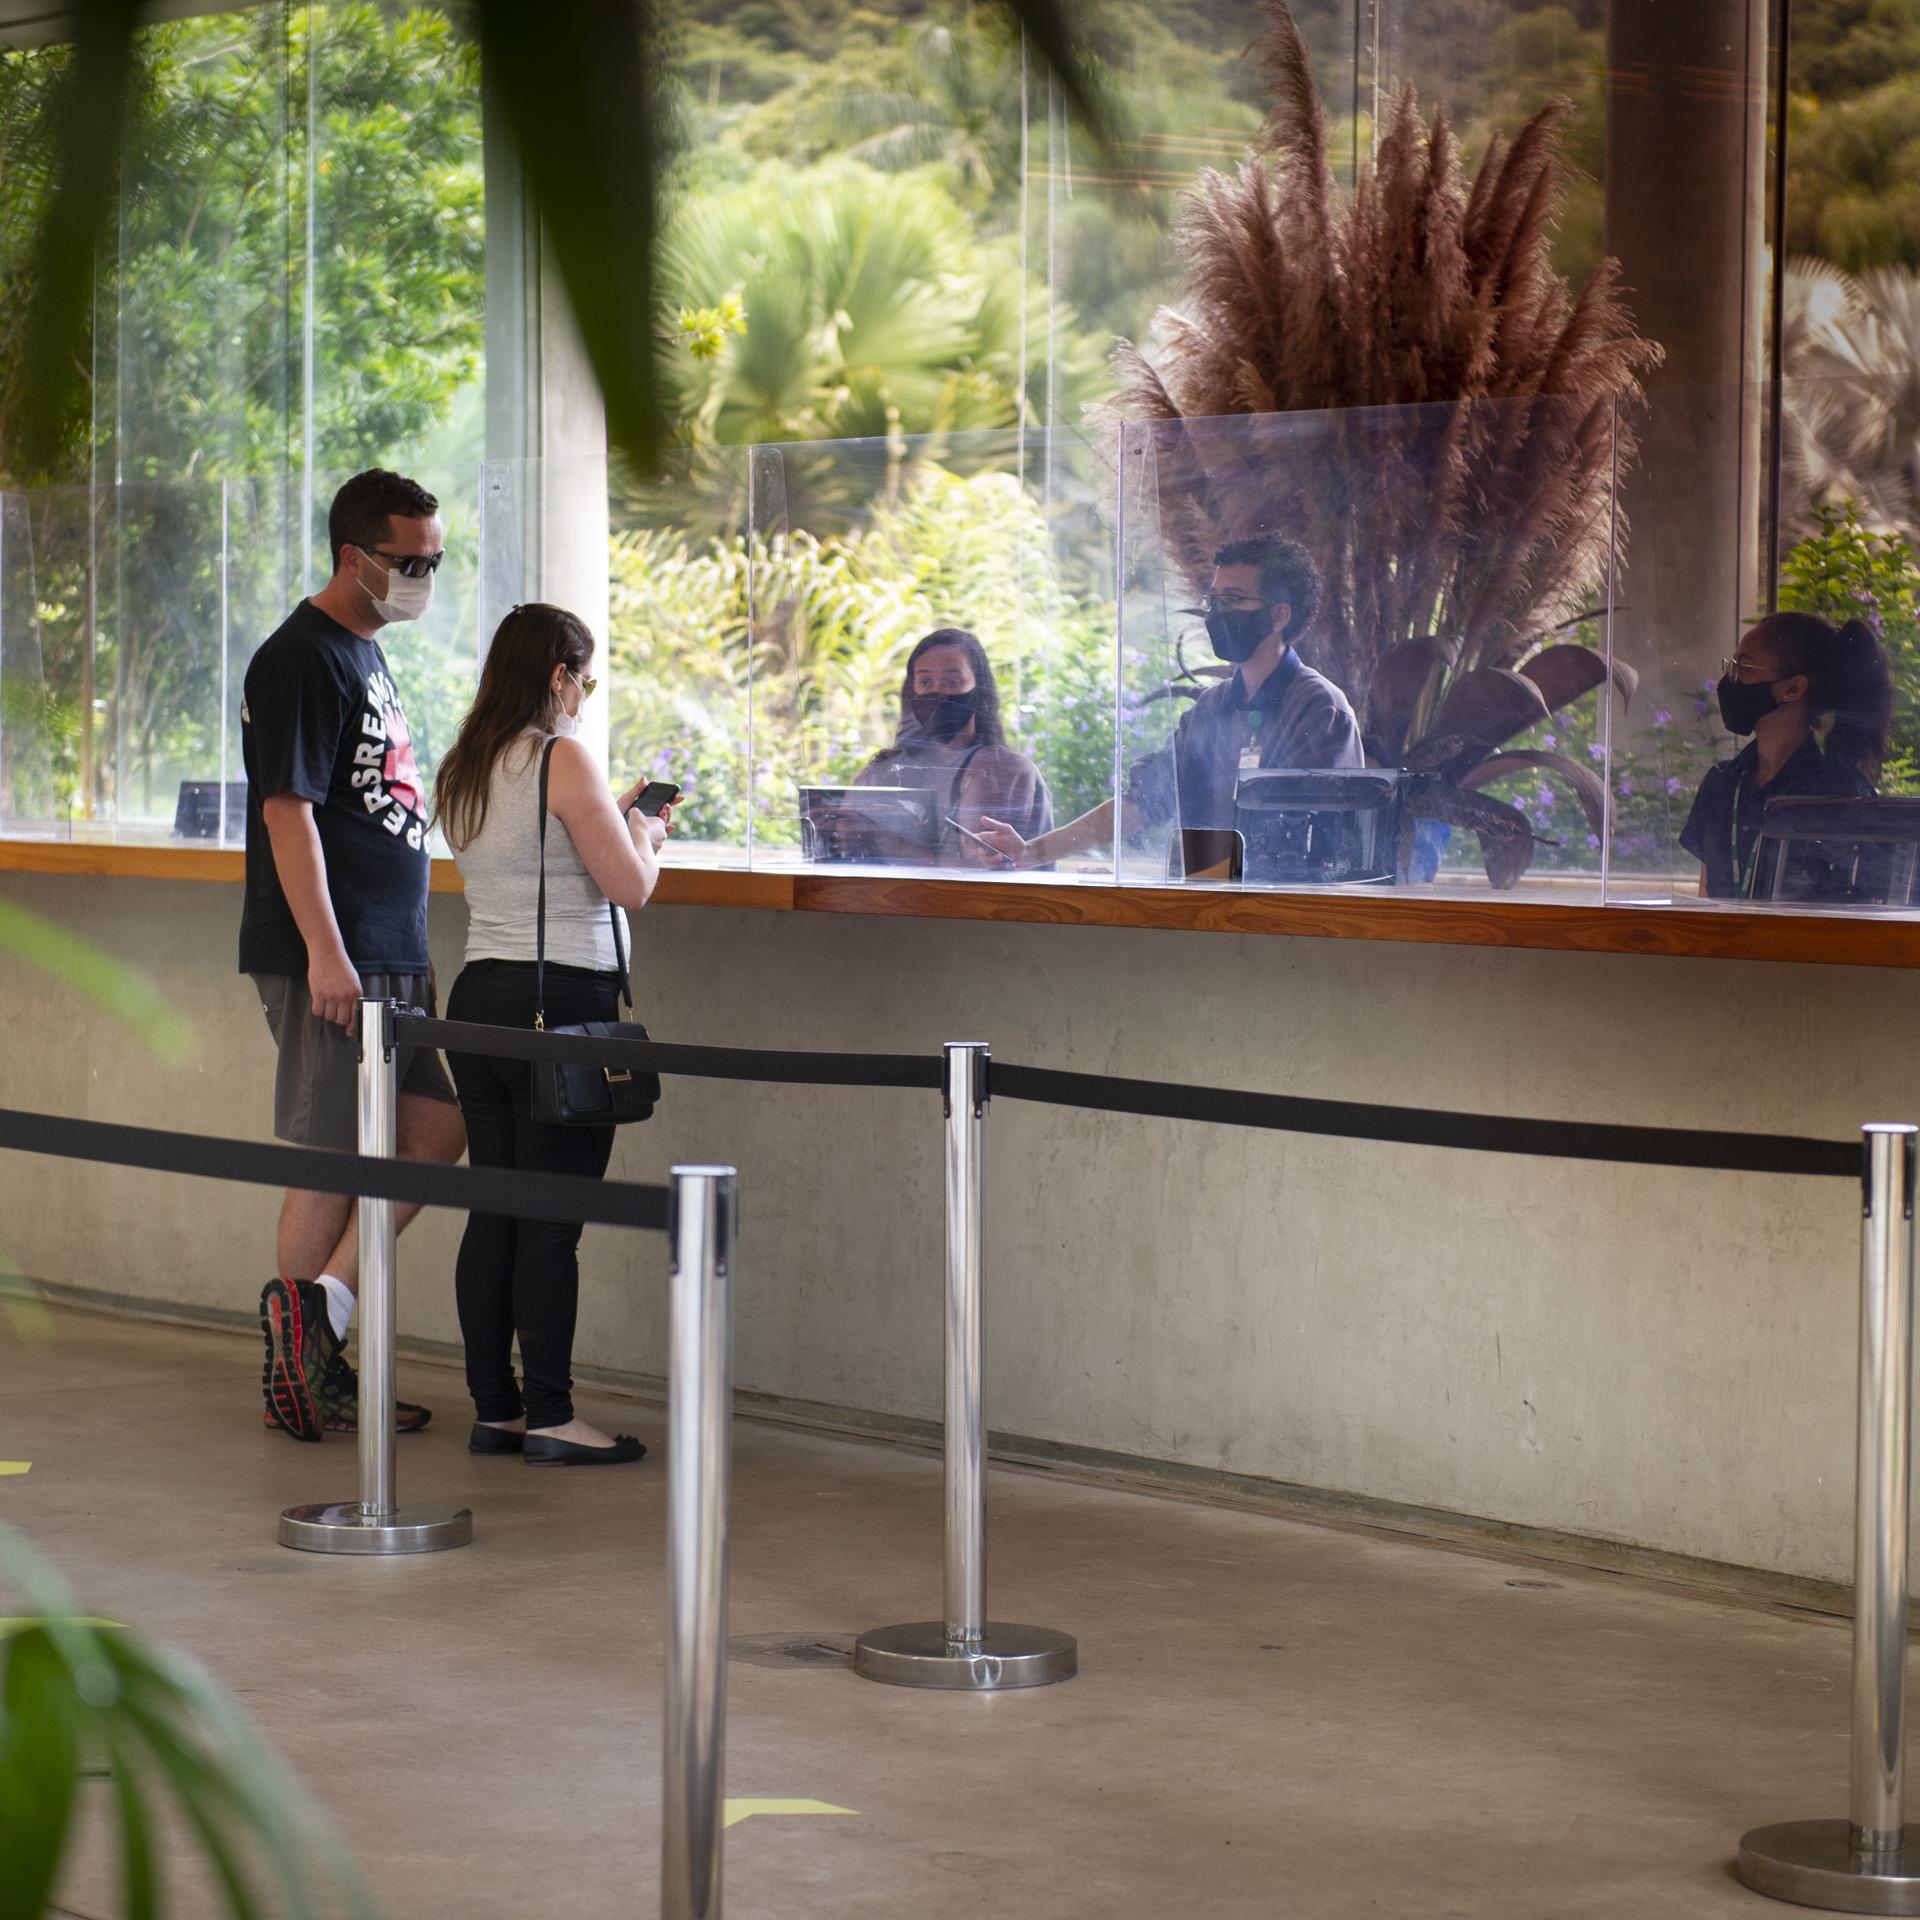 Visite Inhotim protocolo covid-19 visitantes na recepção